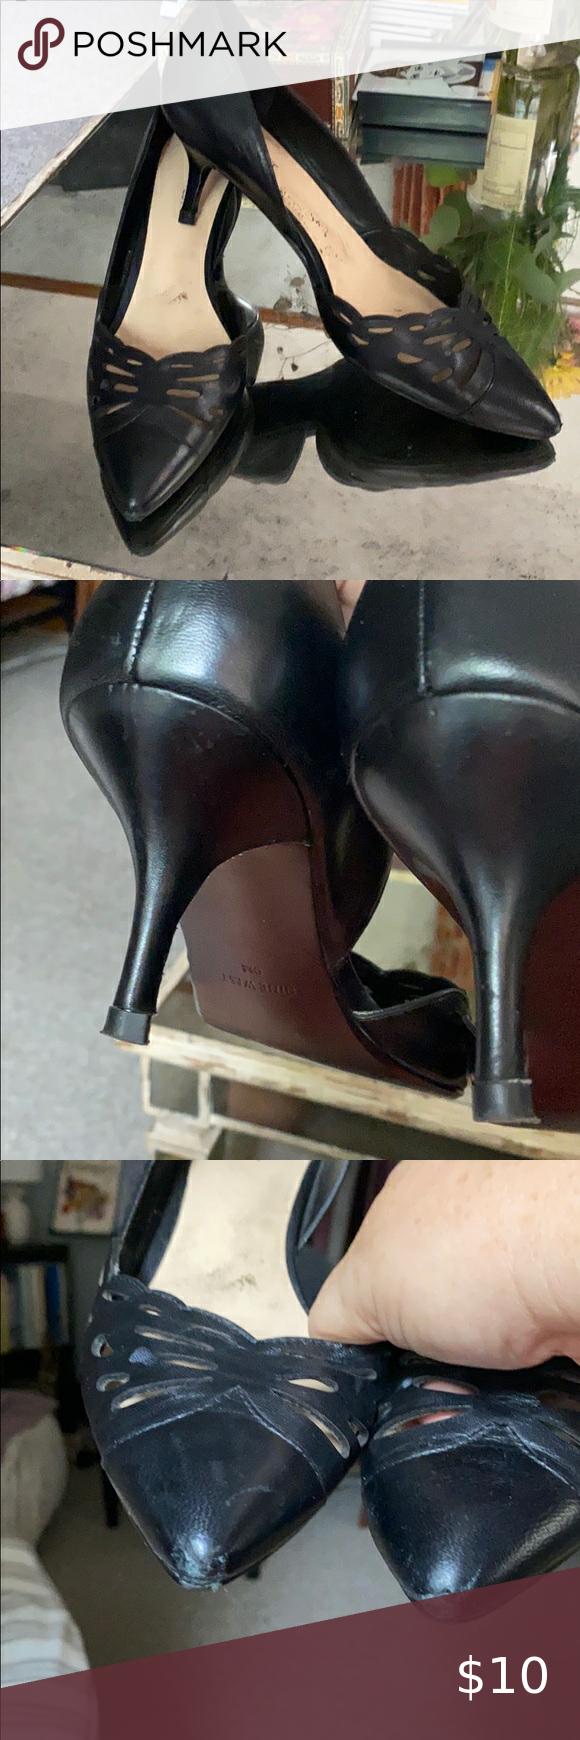 Leather Kitten Heel Nine West Pumps Size 9 In 2020 Kitten Heels Heels Shoes Women Heels